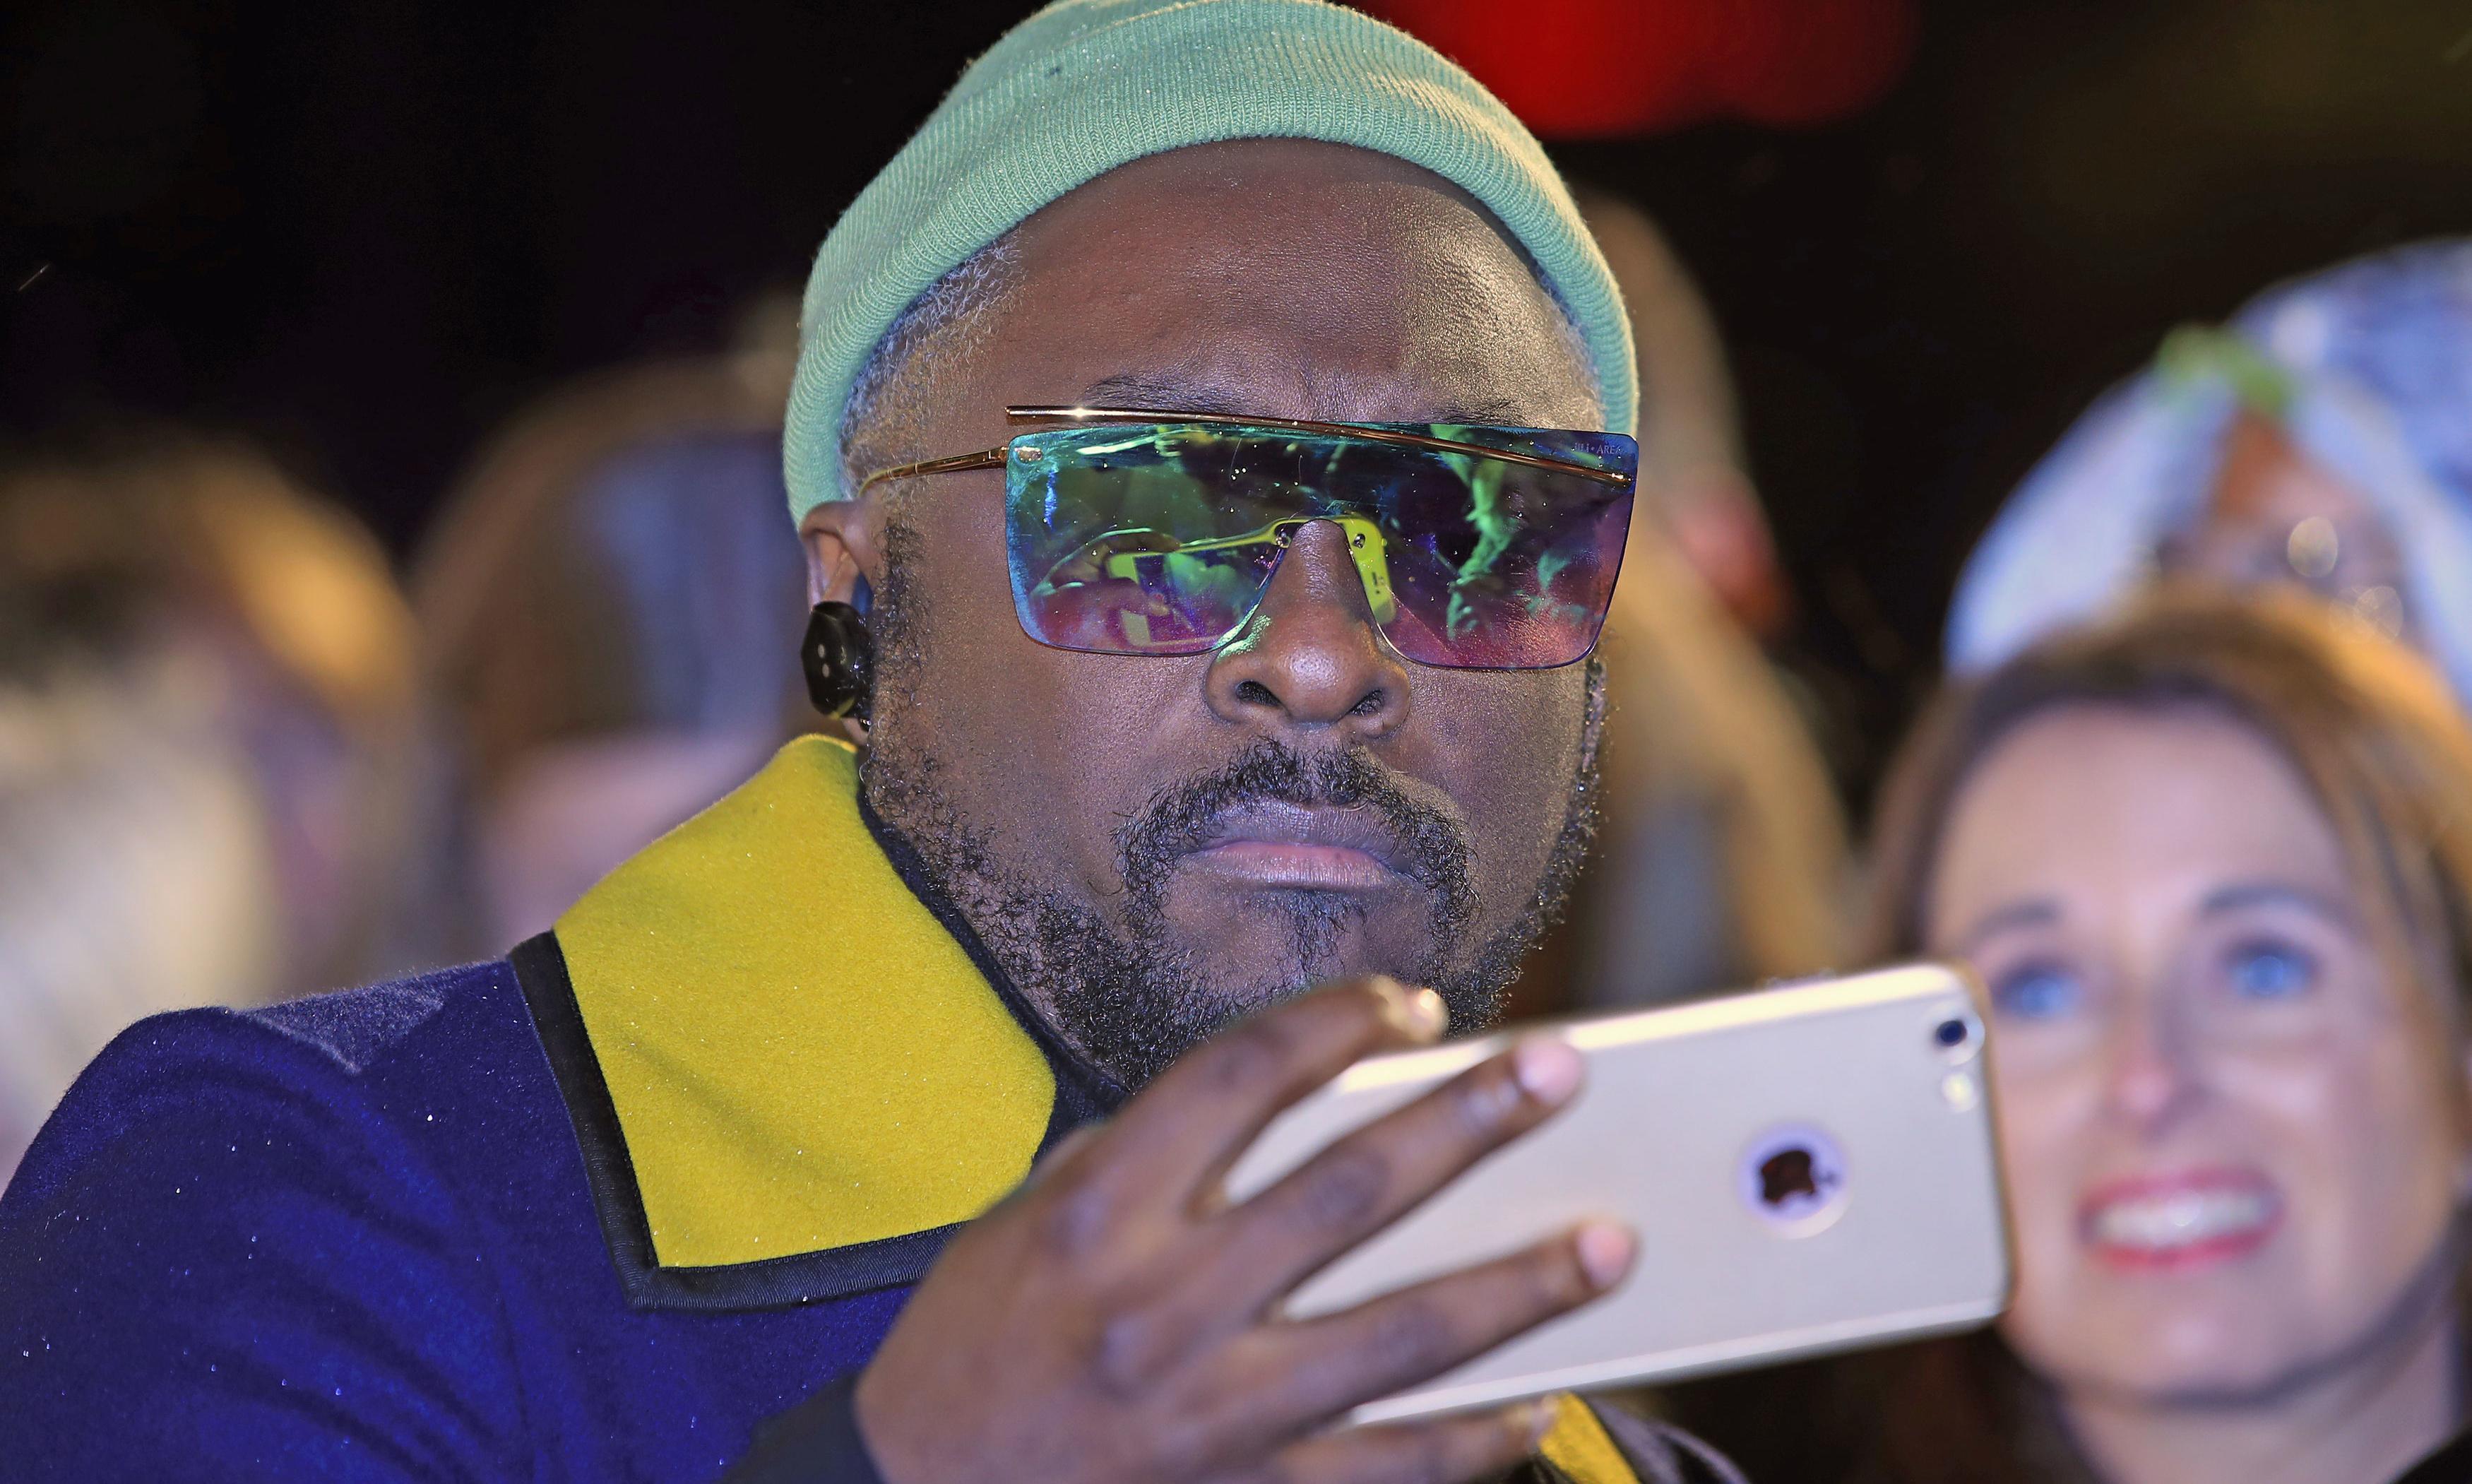 Black Eyed Peas star will.i.am accuses Qantas flight attendant of being racist